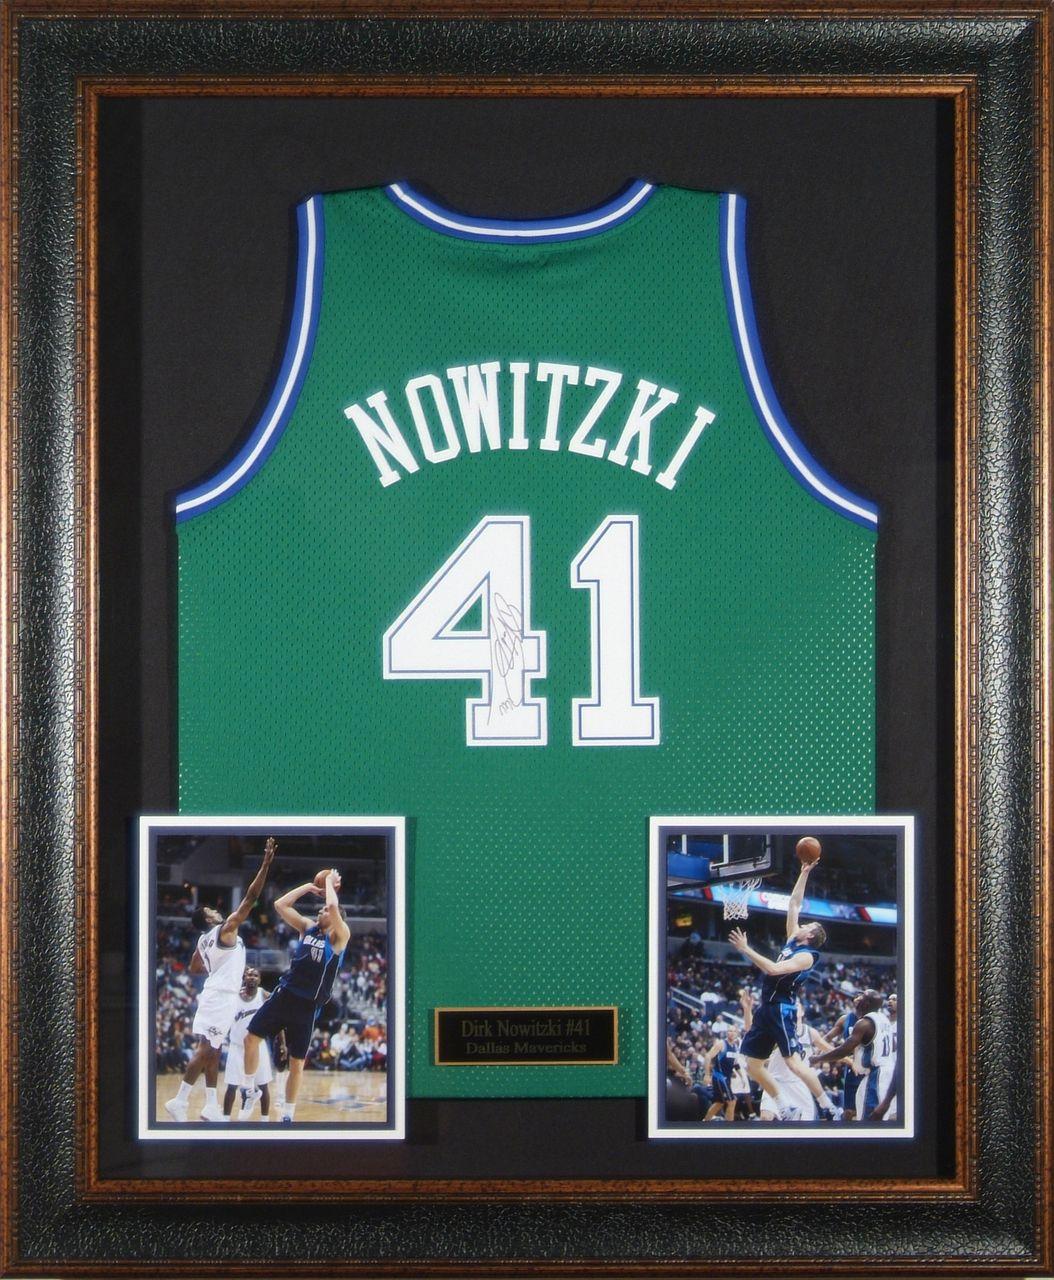 7ff426e959df Dirk Nowitzki Autographed Jersey Framed